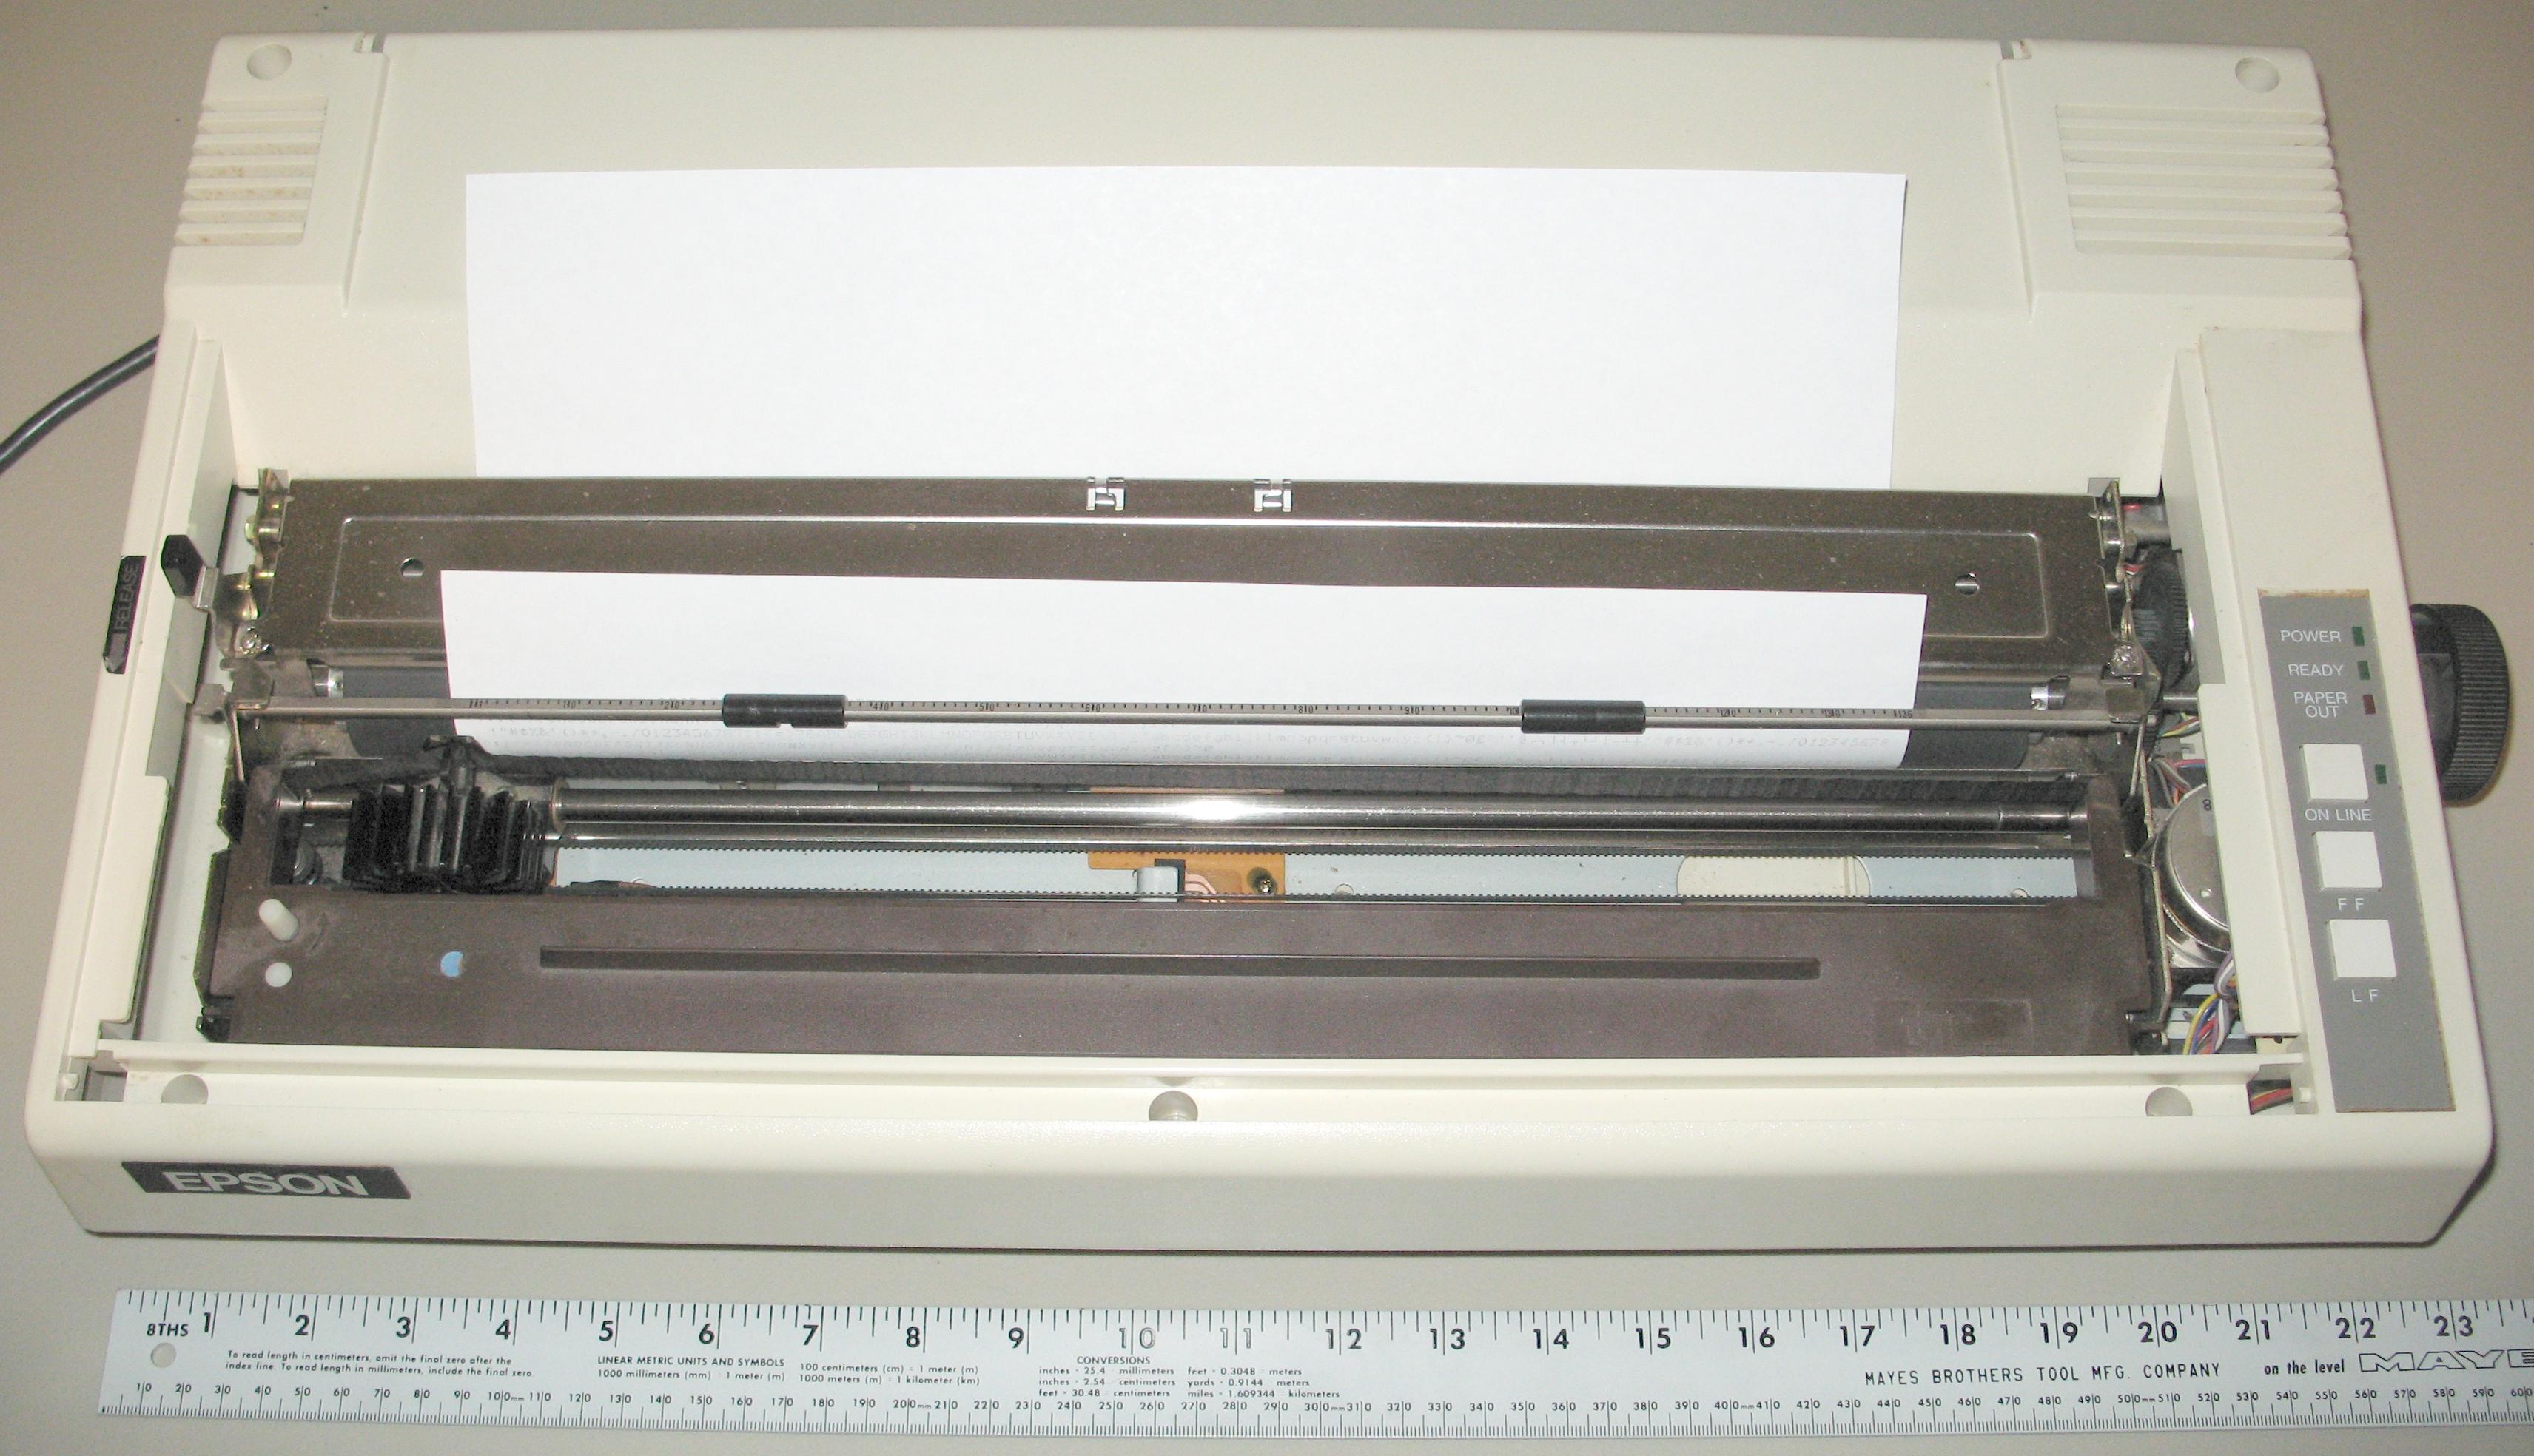 "hisisanexampleofawide-carriagedotmatrixprinter,designedforwidepaper,shownwithlegalpaper.idecarriageprinterswereoftenusedinthefieldofbusinesses,toprintaccountingrecordsontractor-feedpaper.heywerealsocalled""132-columnprinters""."